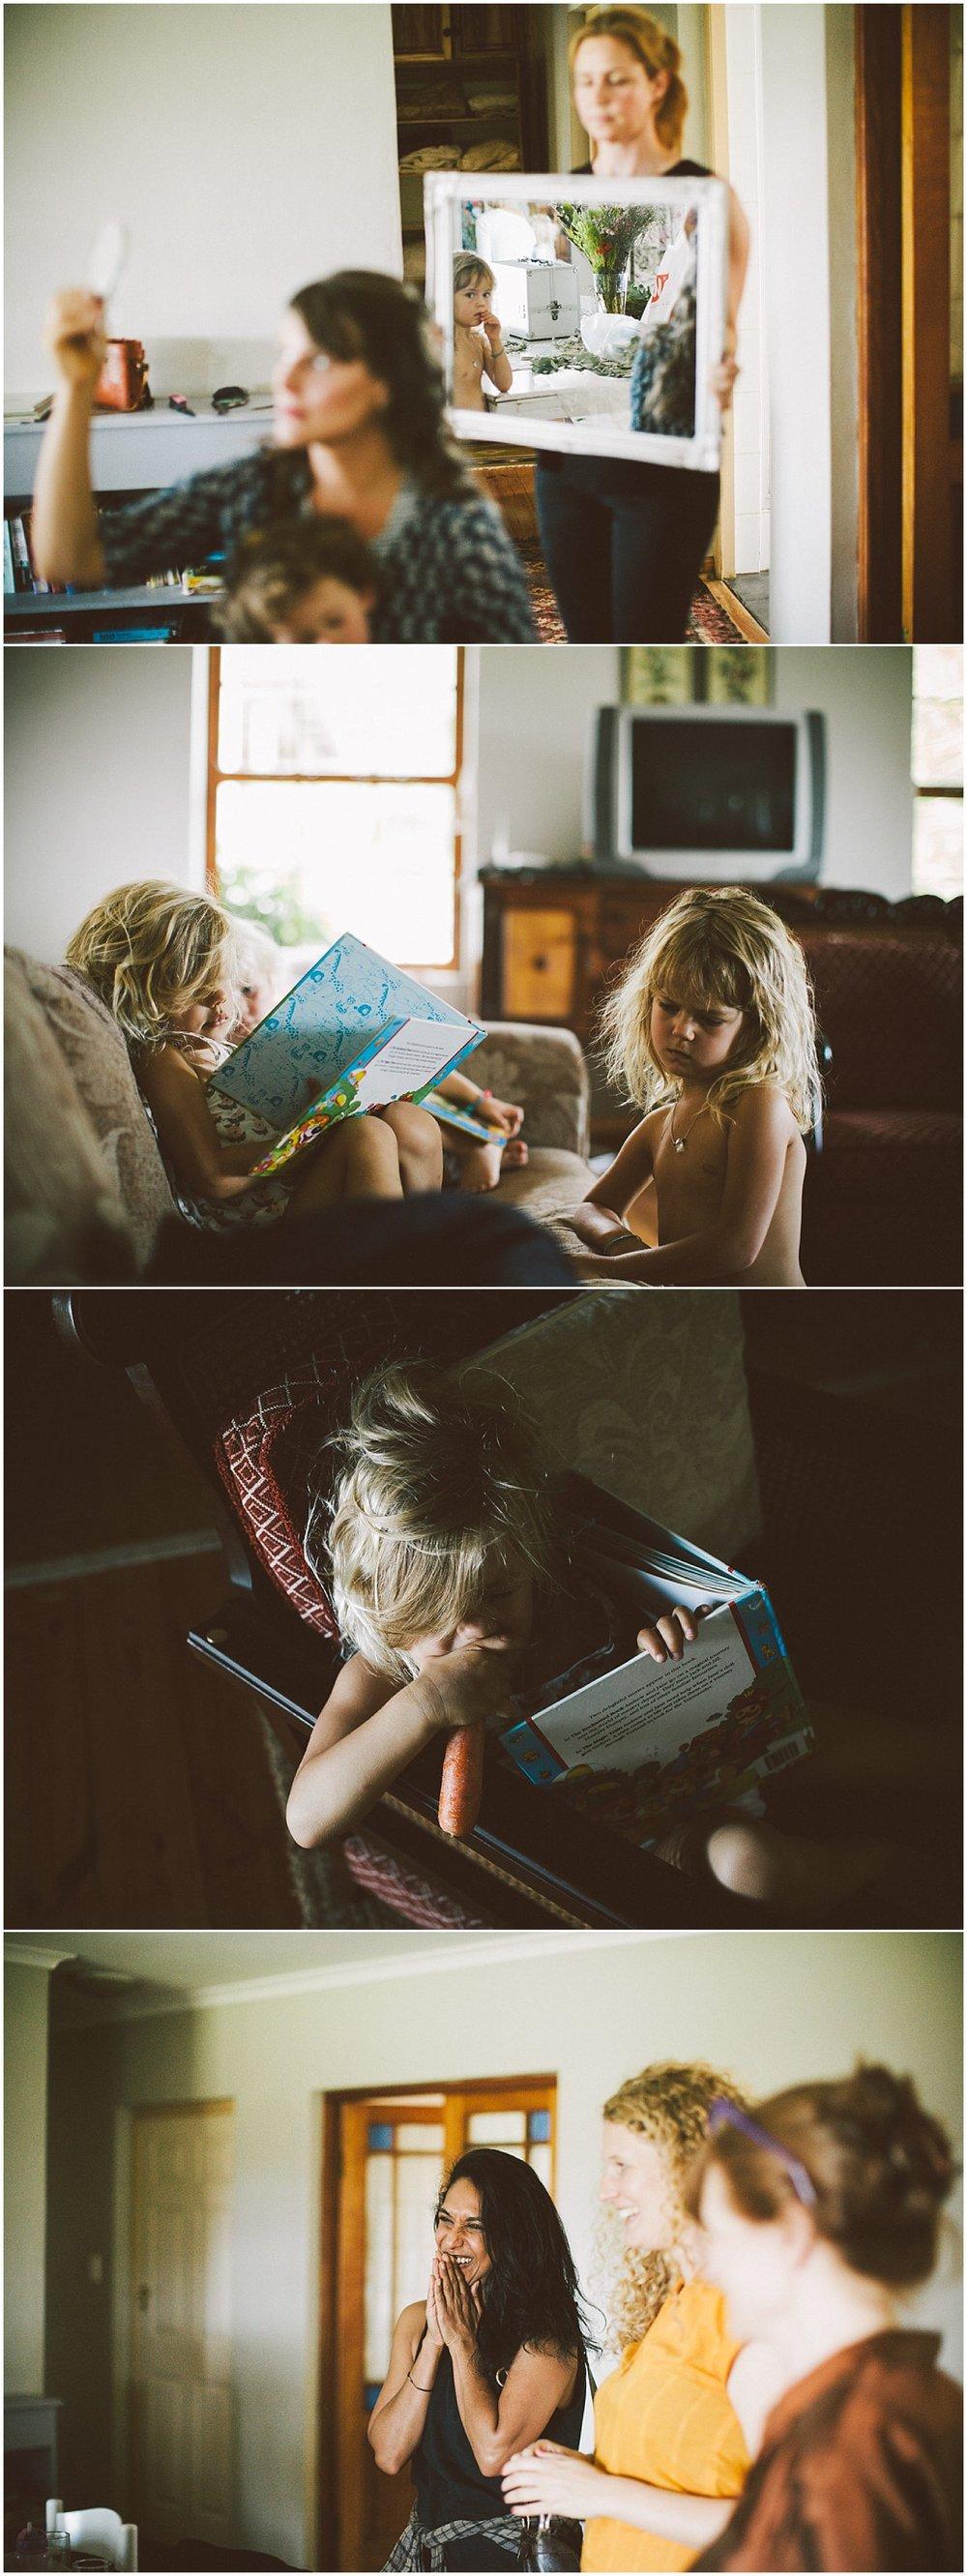 Matthew&Lucie_Fiona Clair-16.jpg